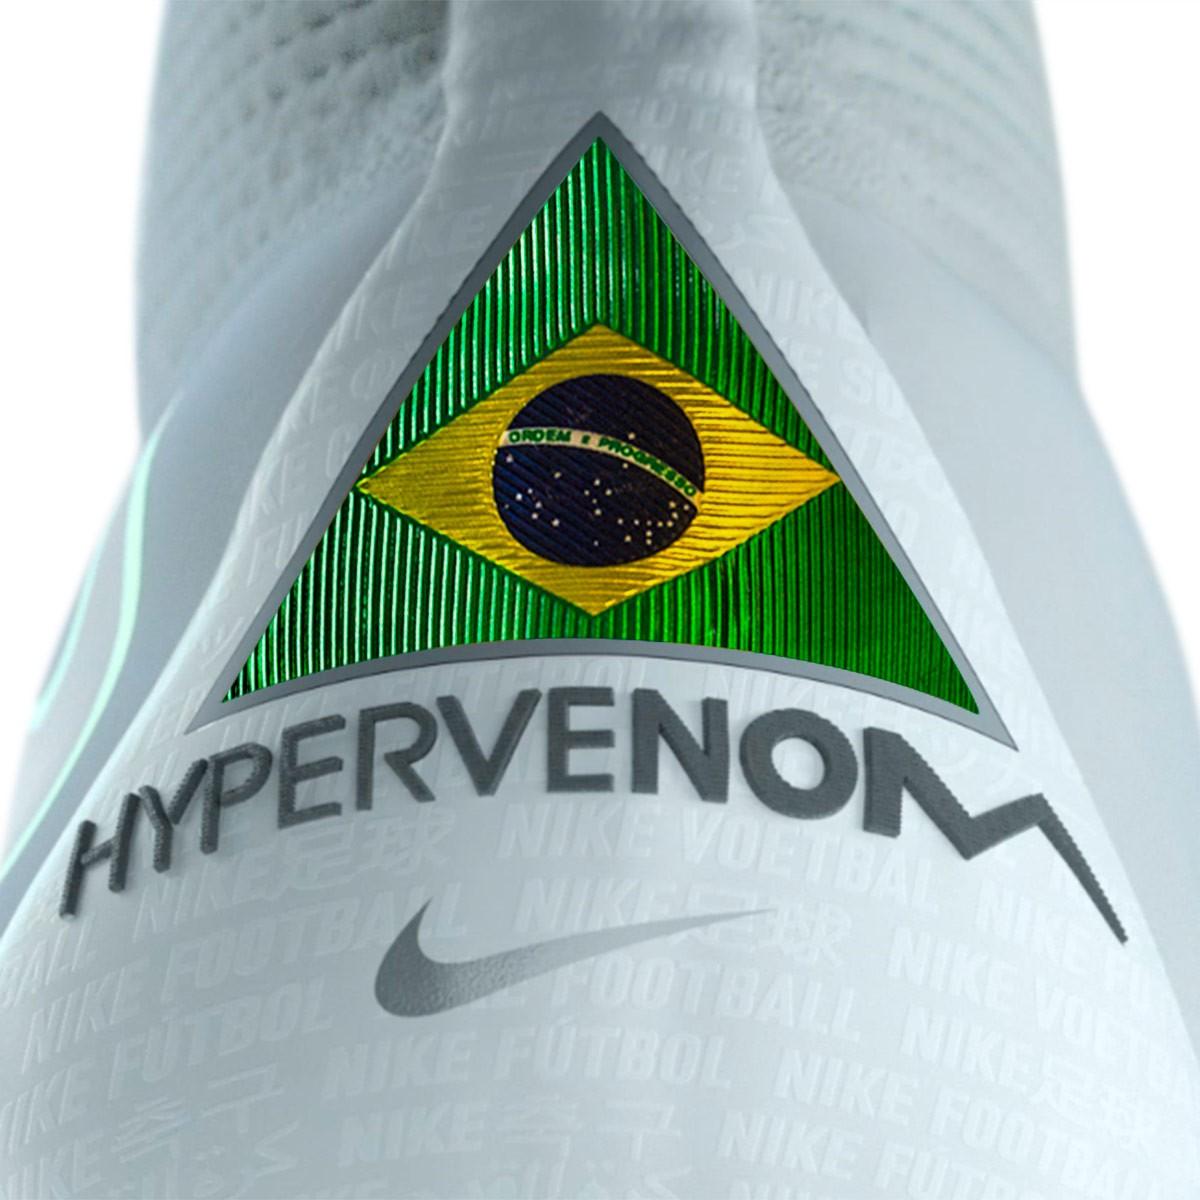 Scarpe calcio Nike Hypervenom FG Phantom III Elite DF FG Hypervenom bianca Metallic   abccbb